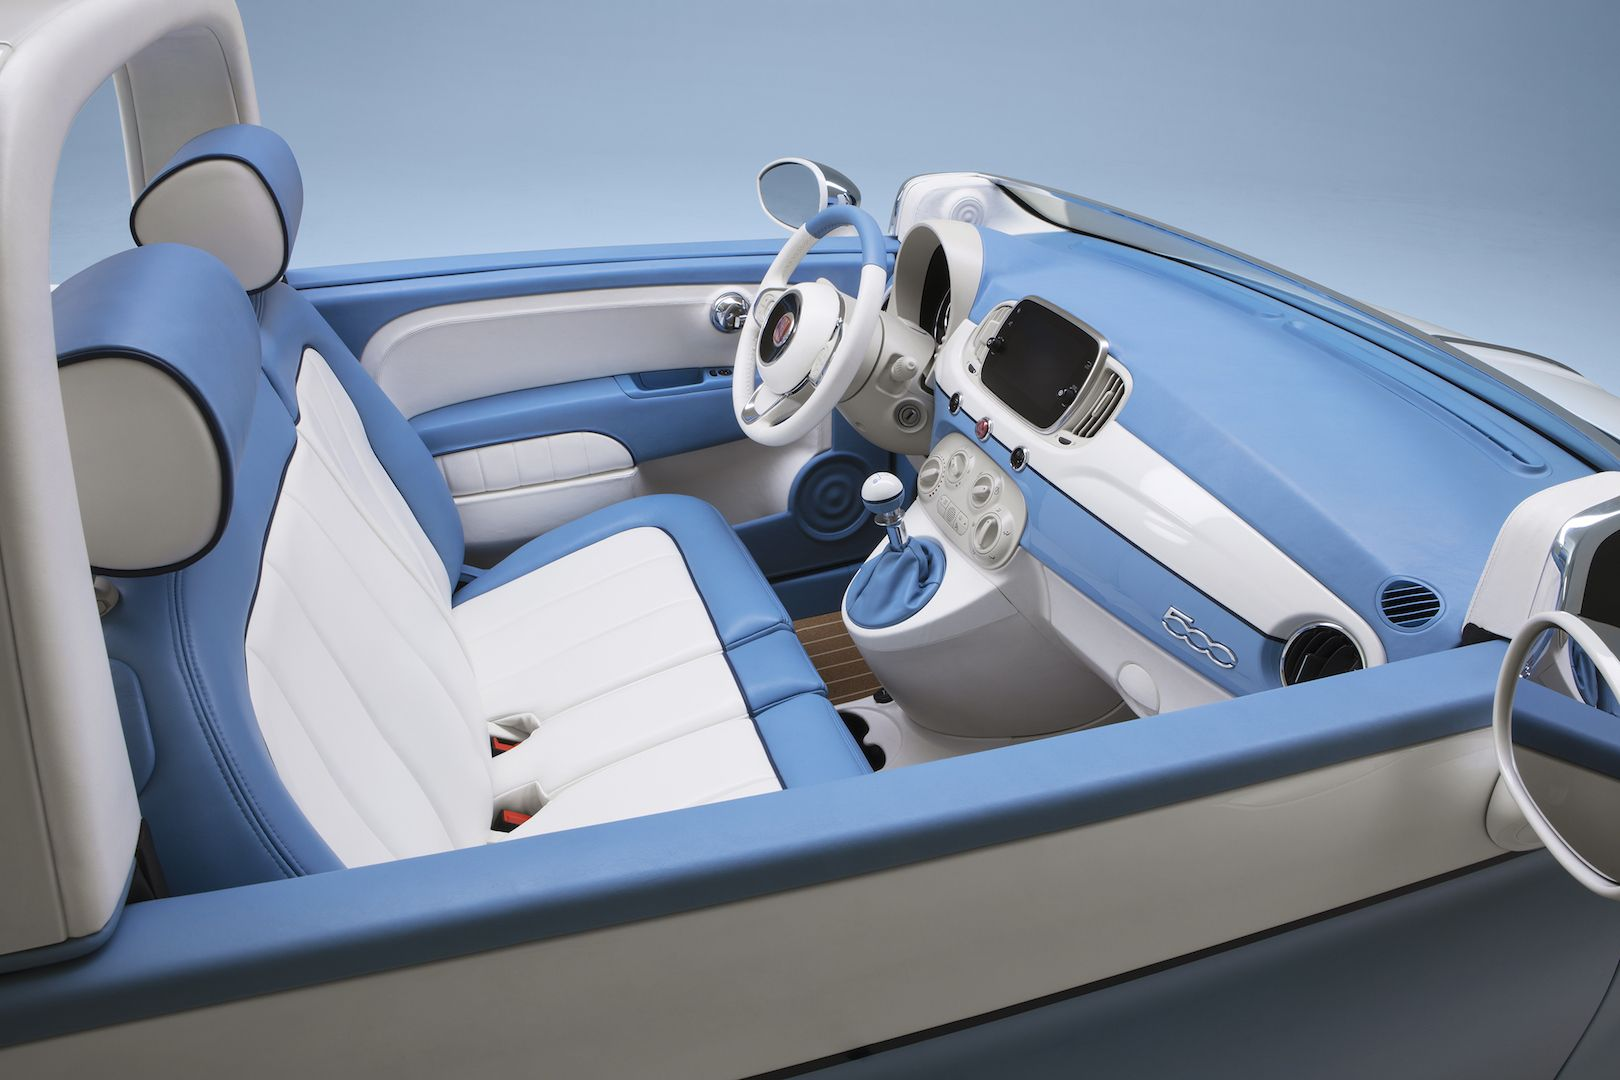 Fiat 500 Spiaggia 58 Cute Italian Blue Inside Details Interior